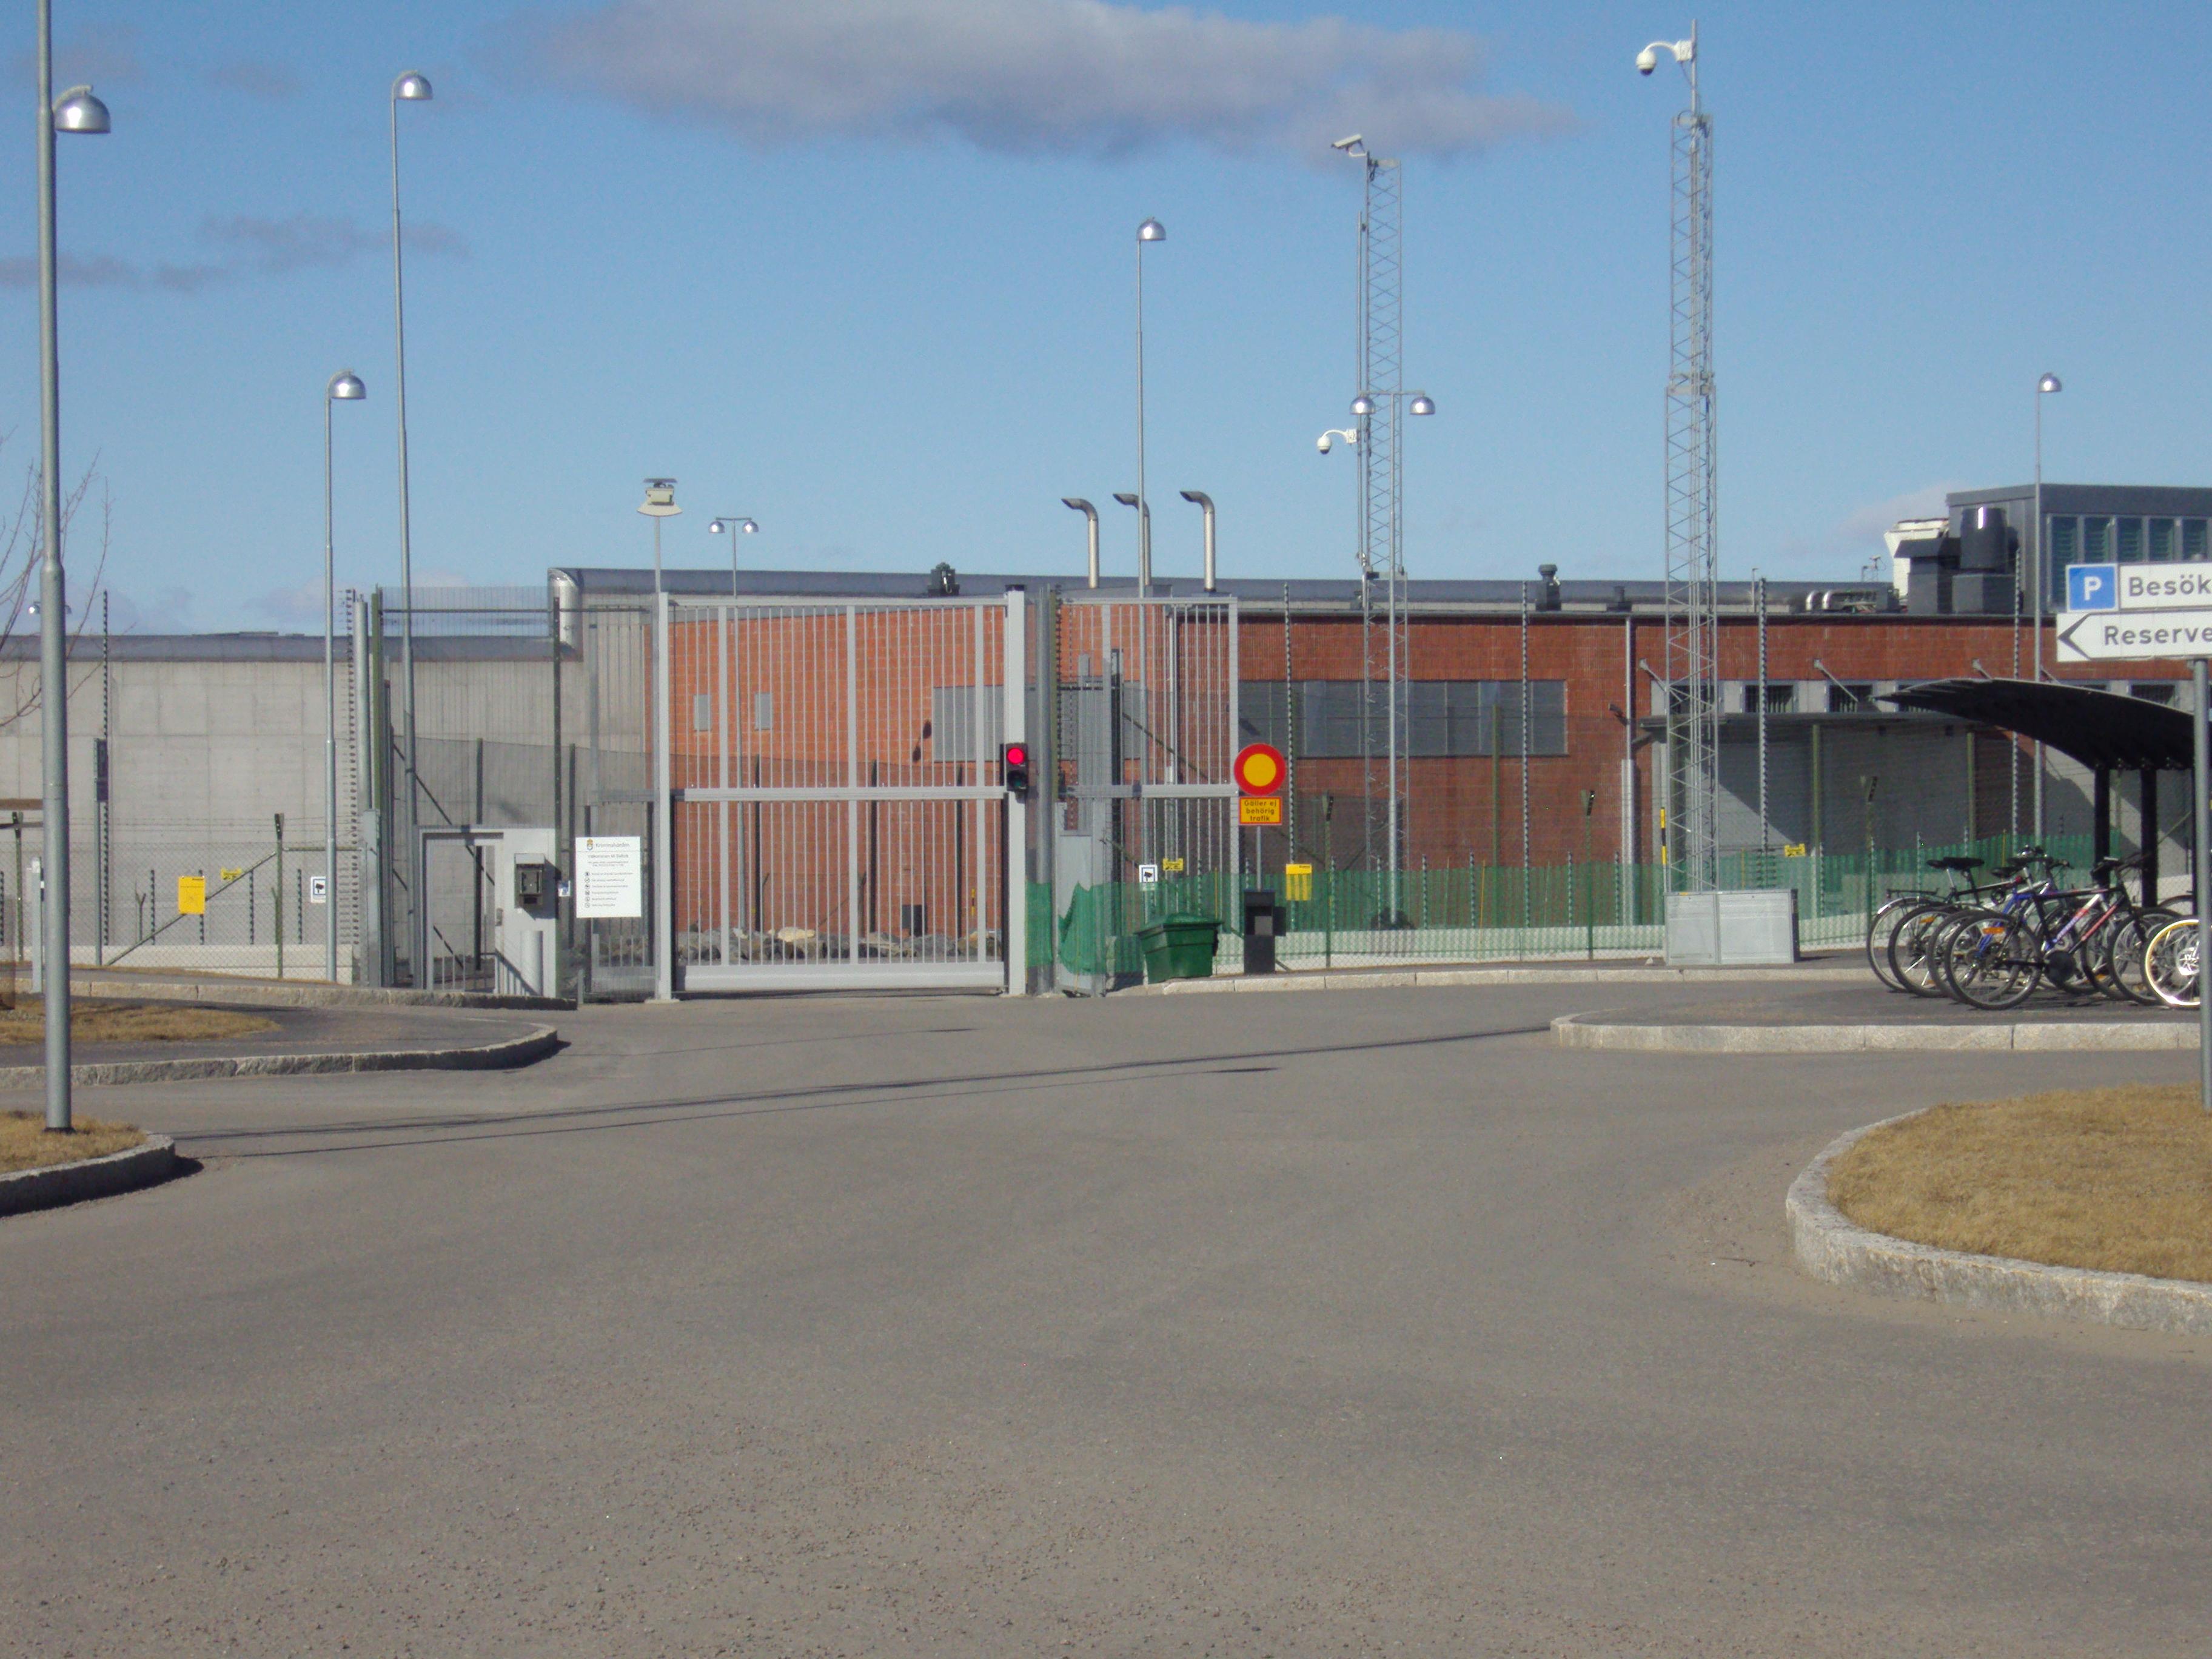 Härnösand Fängelse